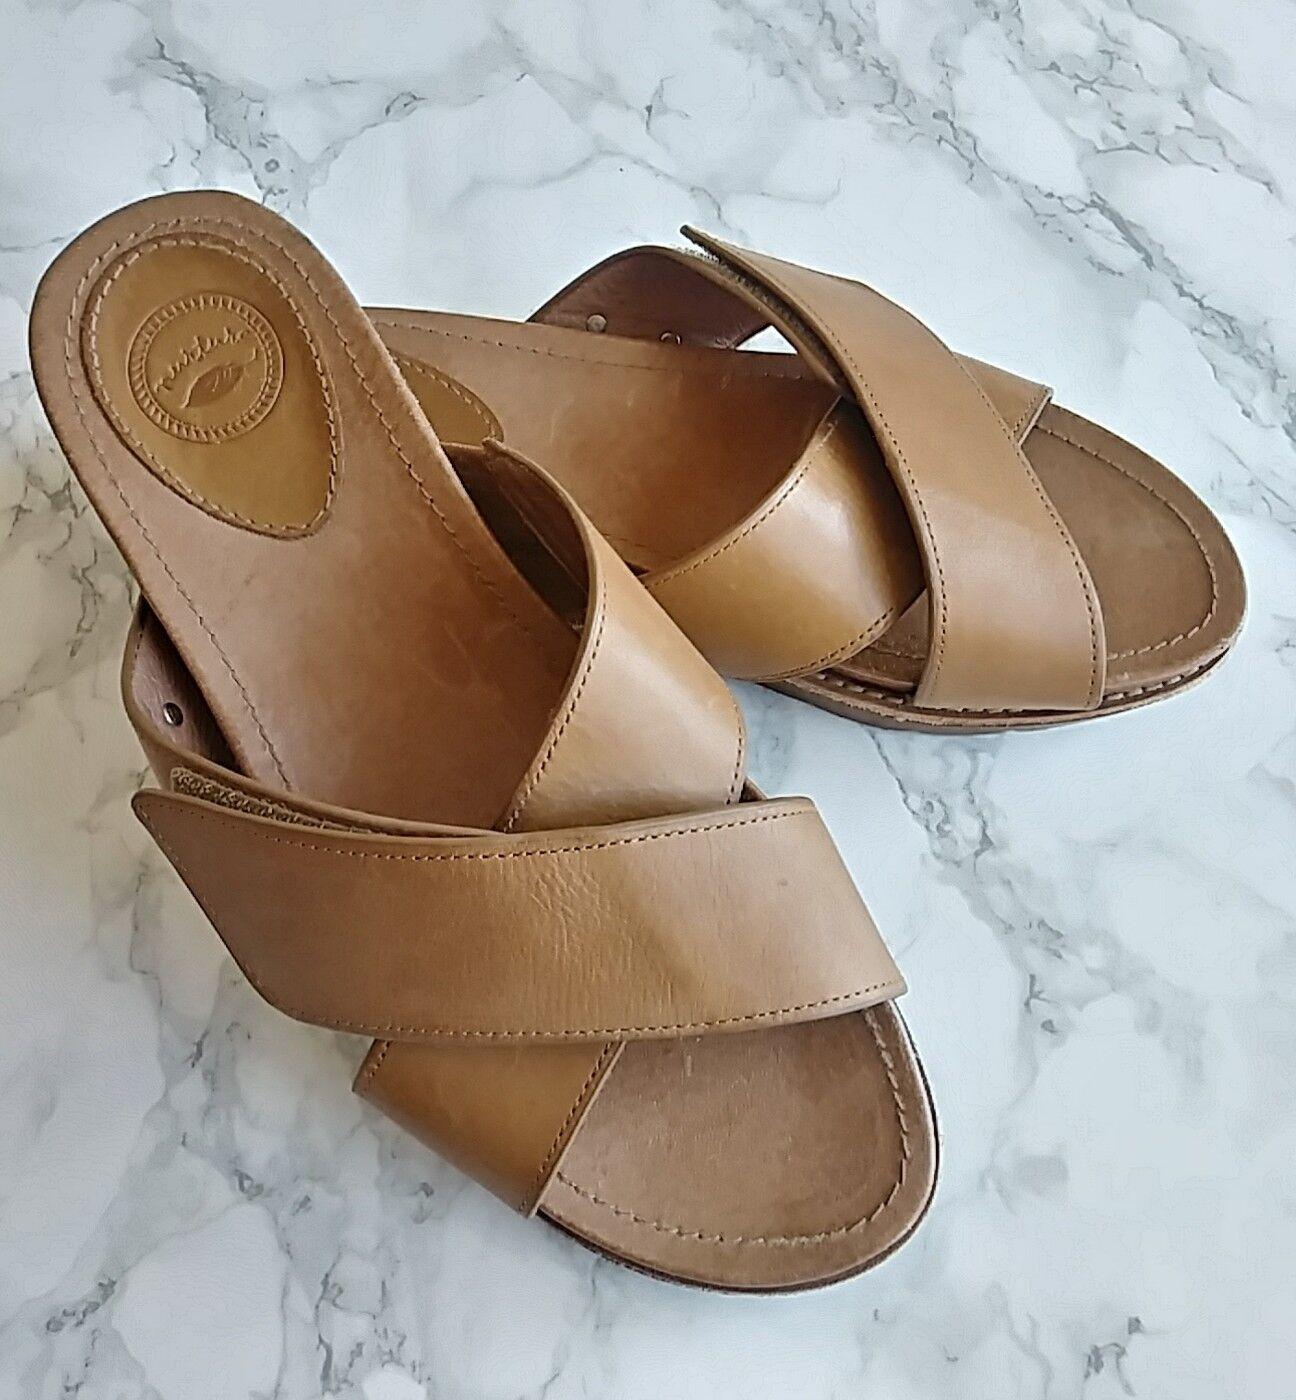 Women's Nurture Brown 7 Leather Platform Slide Sandals US 7 Brown Adjustable Strap e151c8